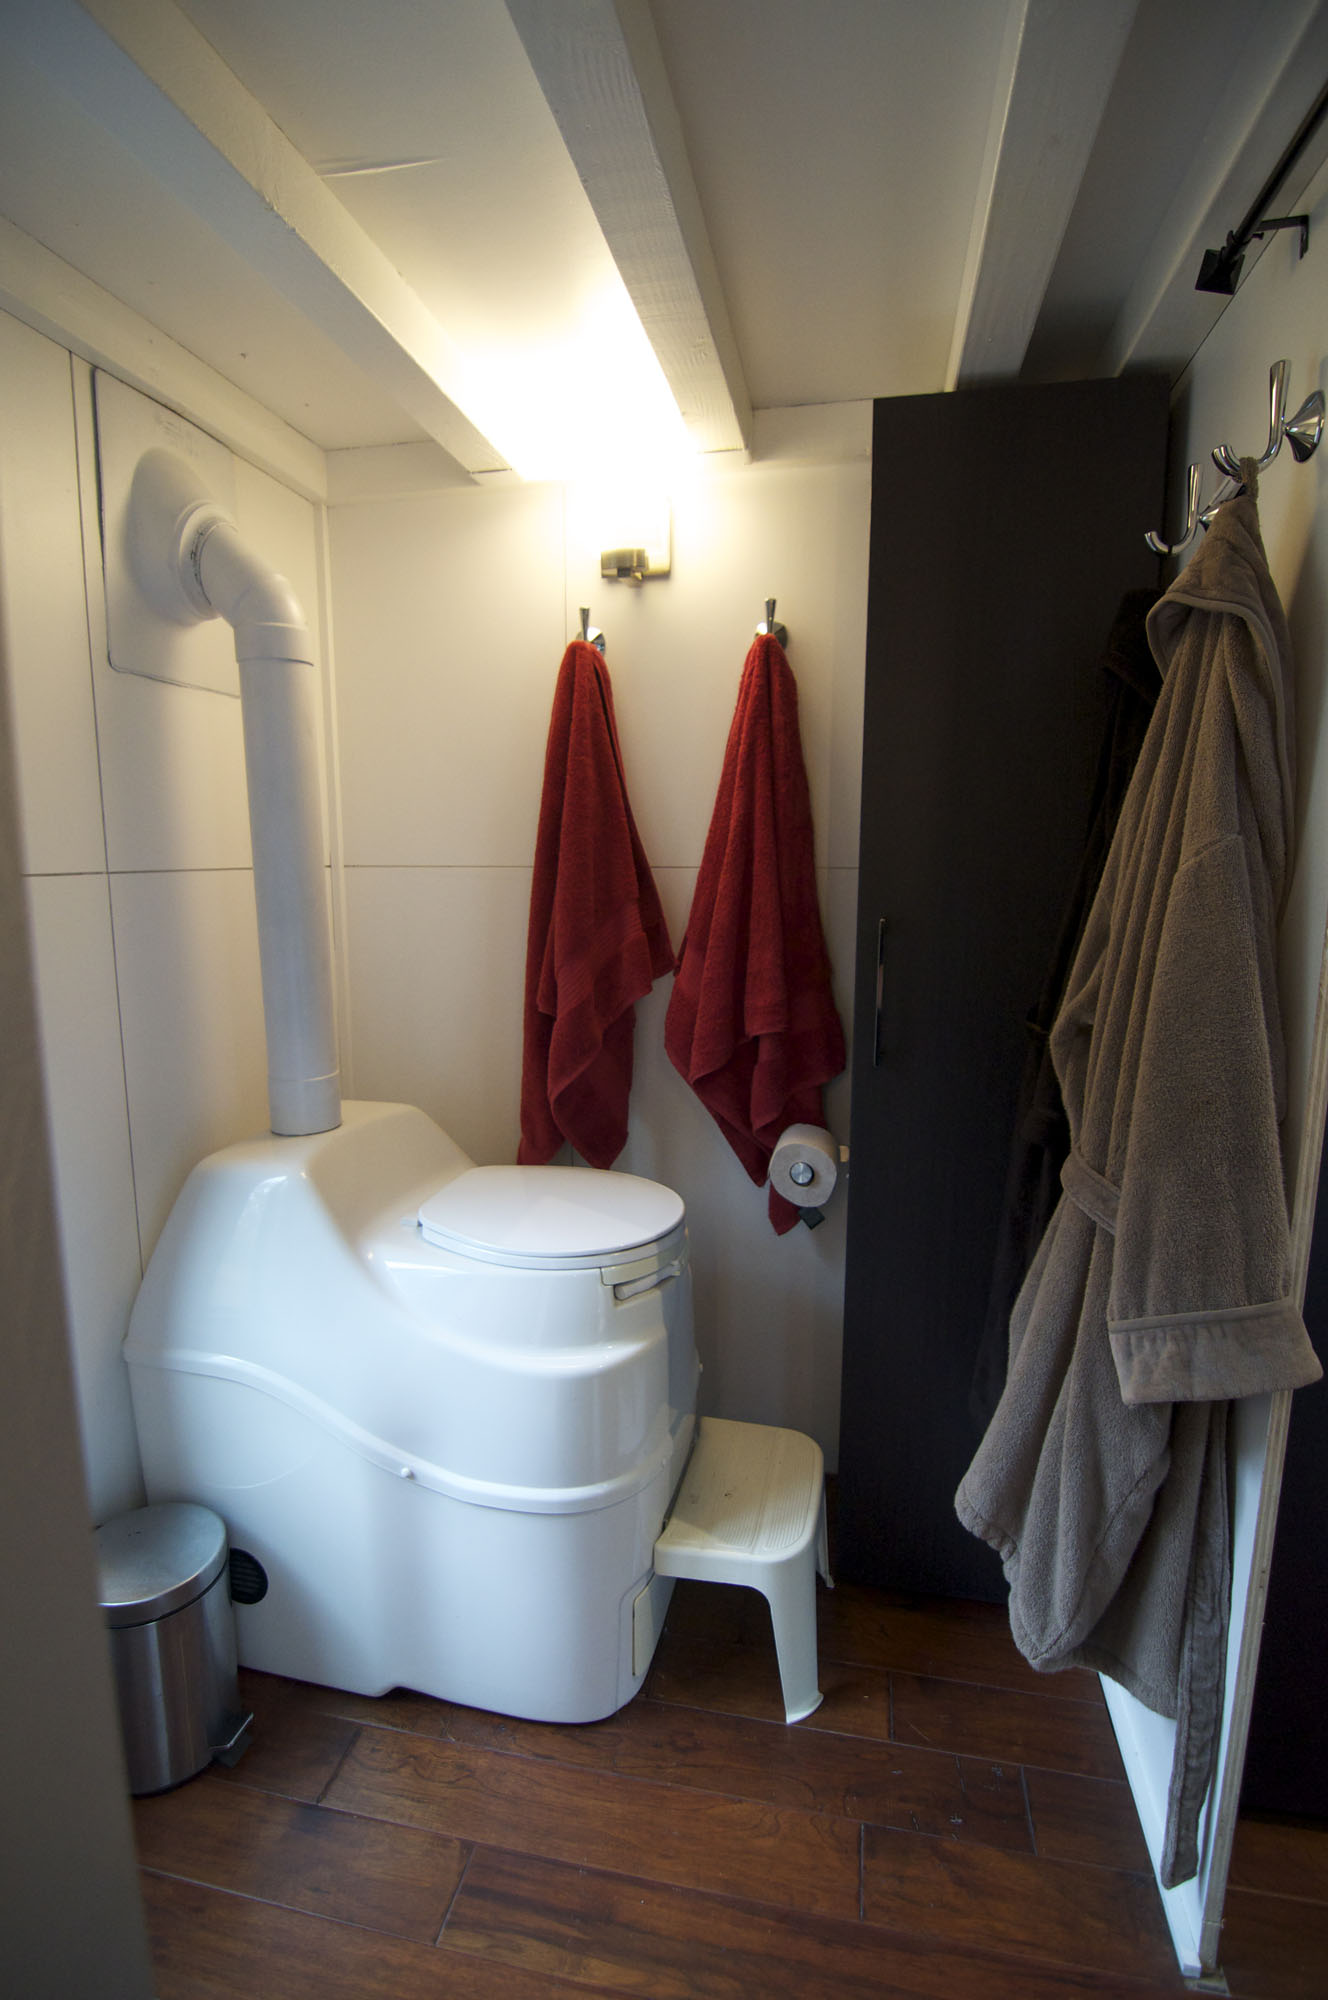 Bathroom Toilet Tiny House on Wheels  Fresh Palace